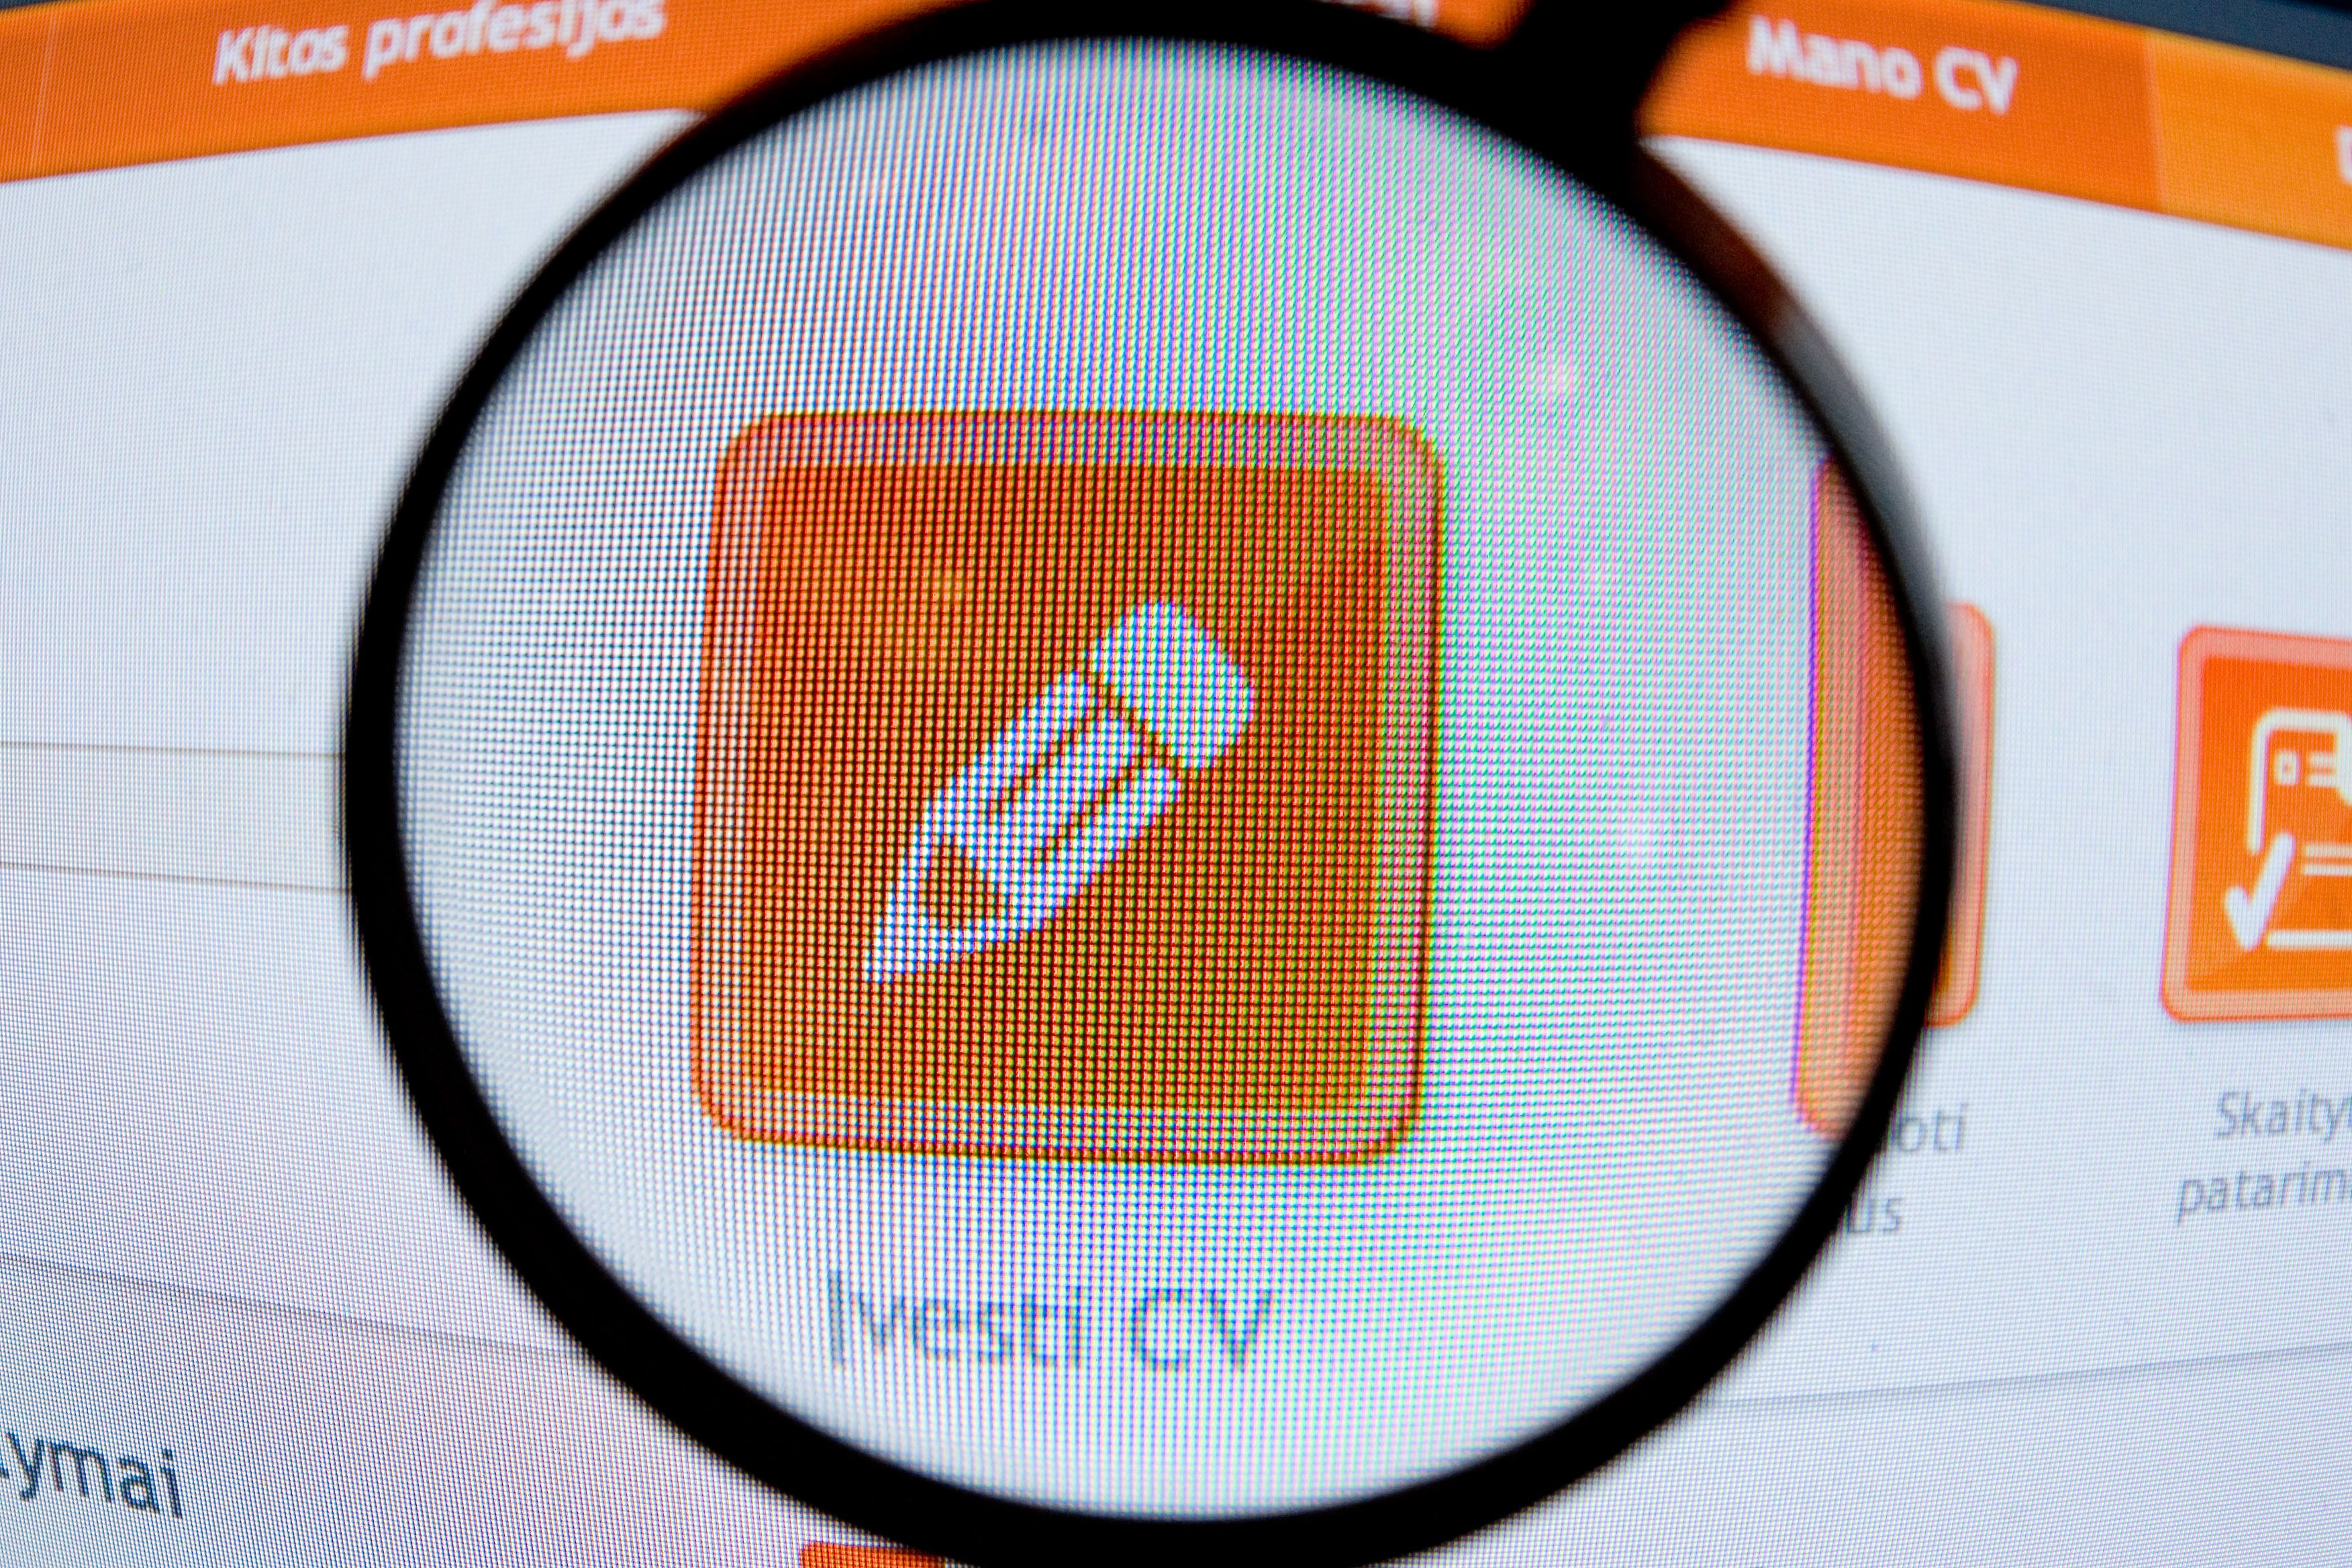 Kaip skaityti kandidat� CV